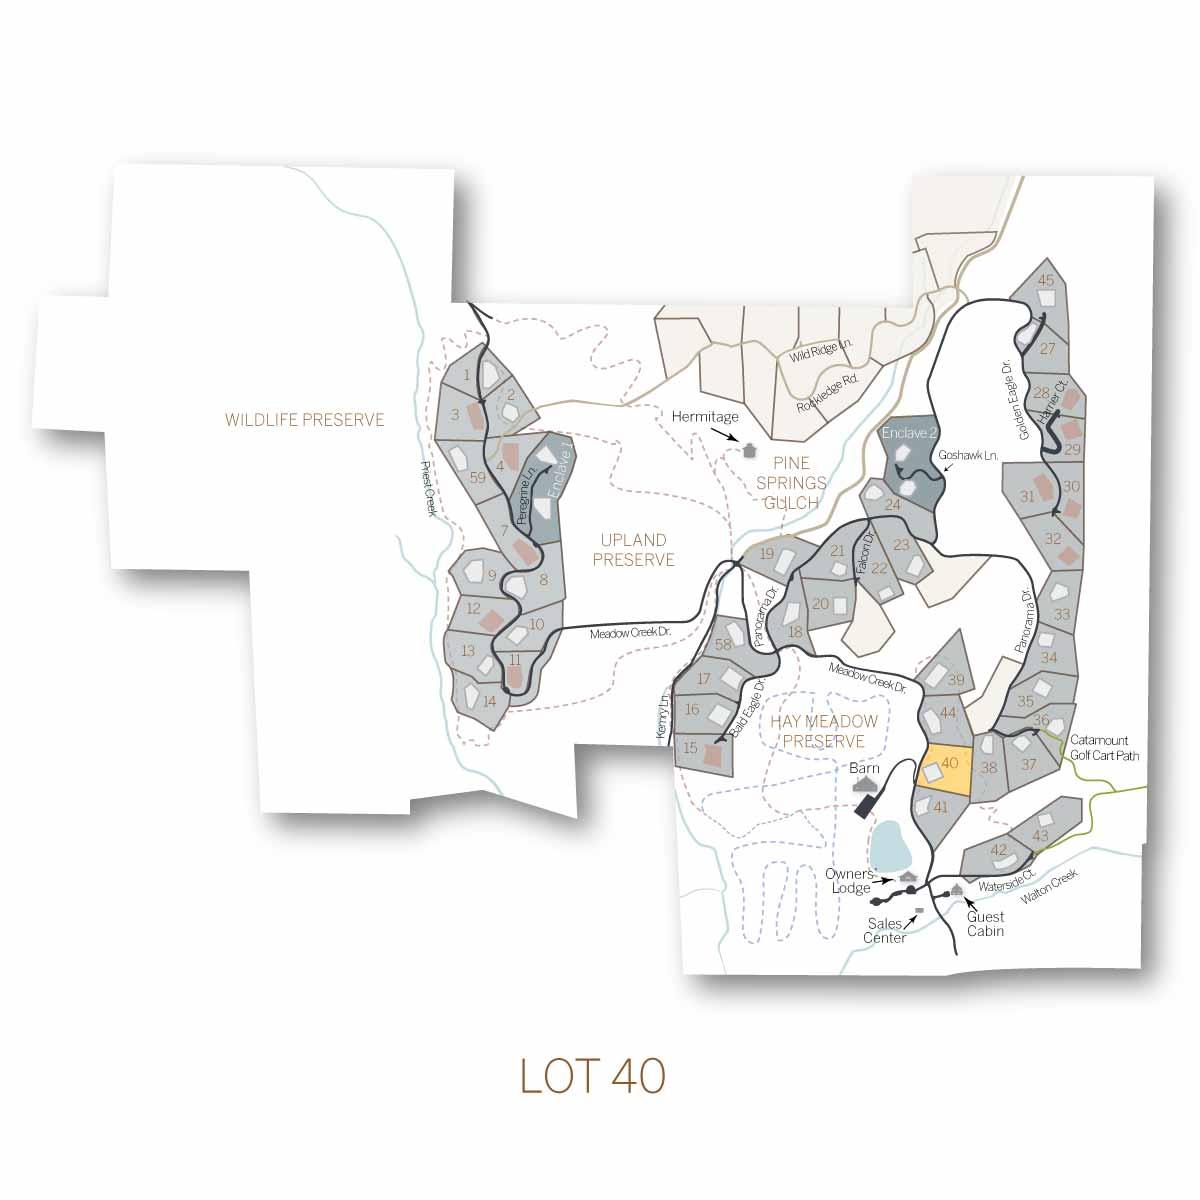 lot 40 1 - Homesite #40